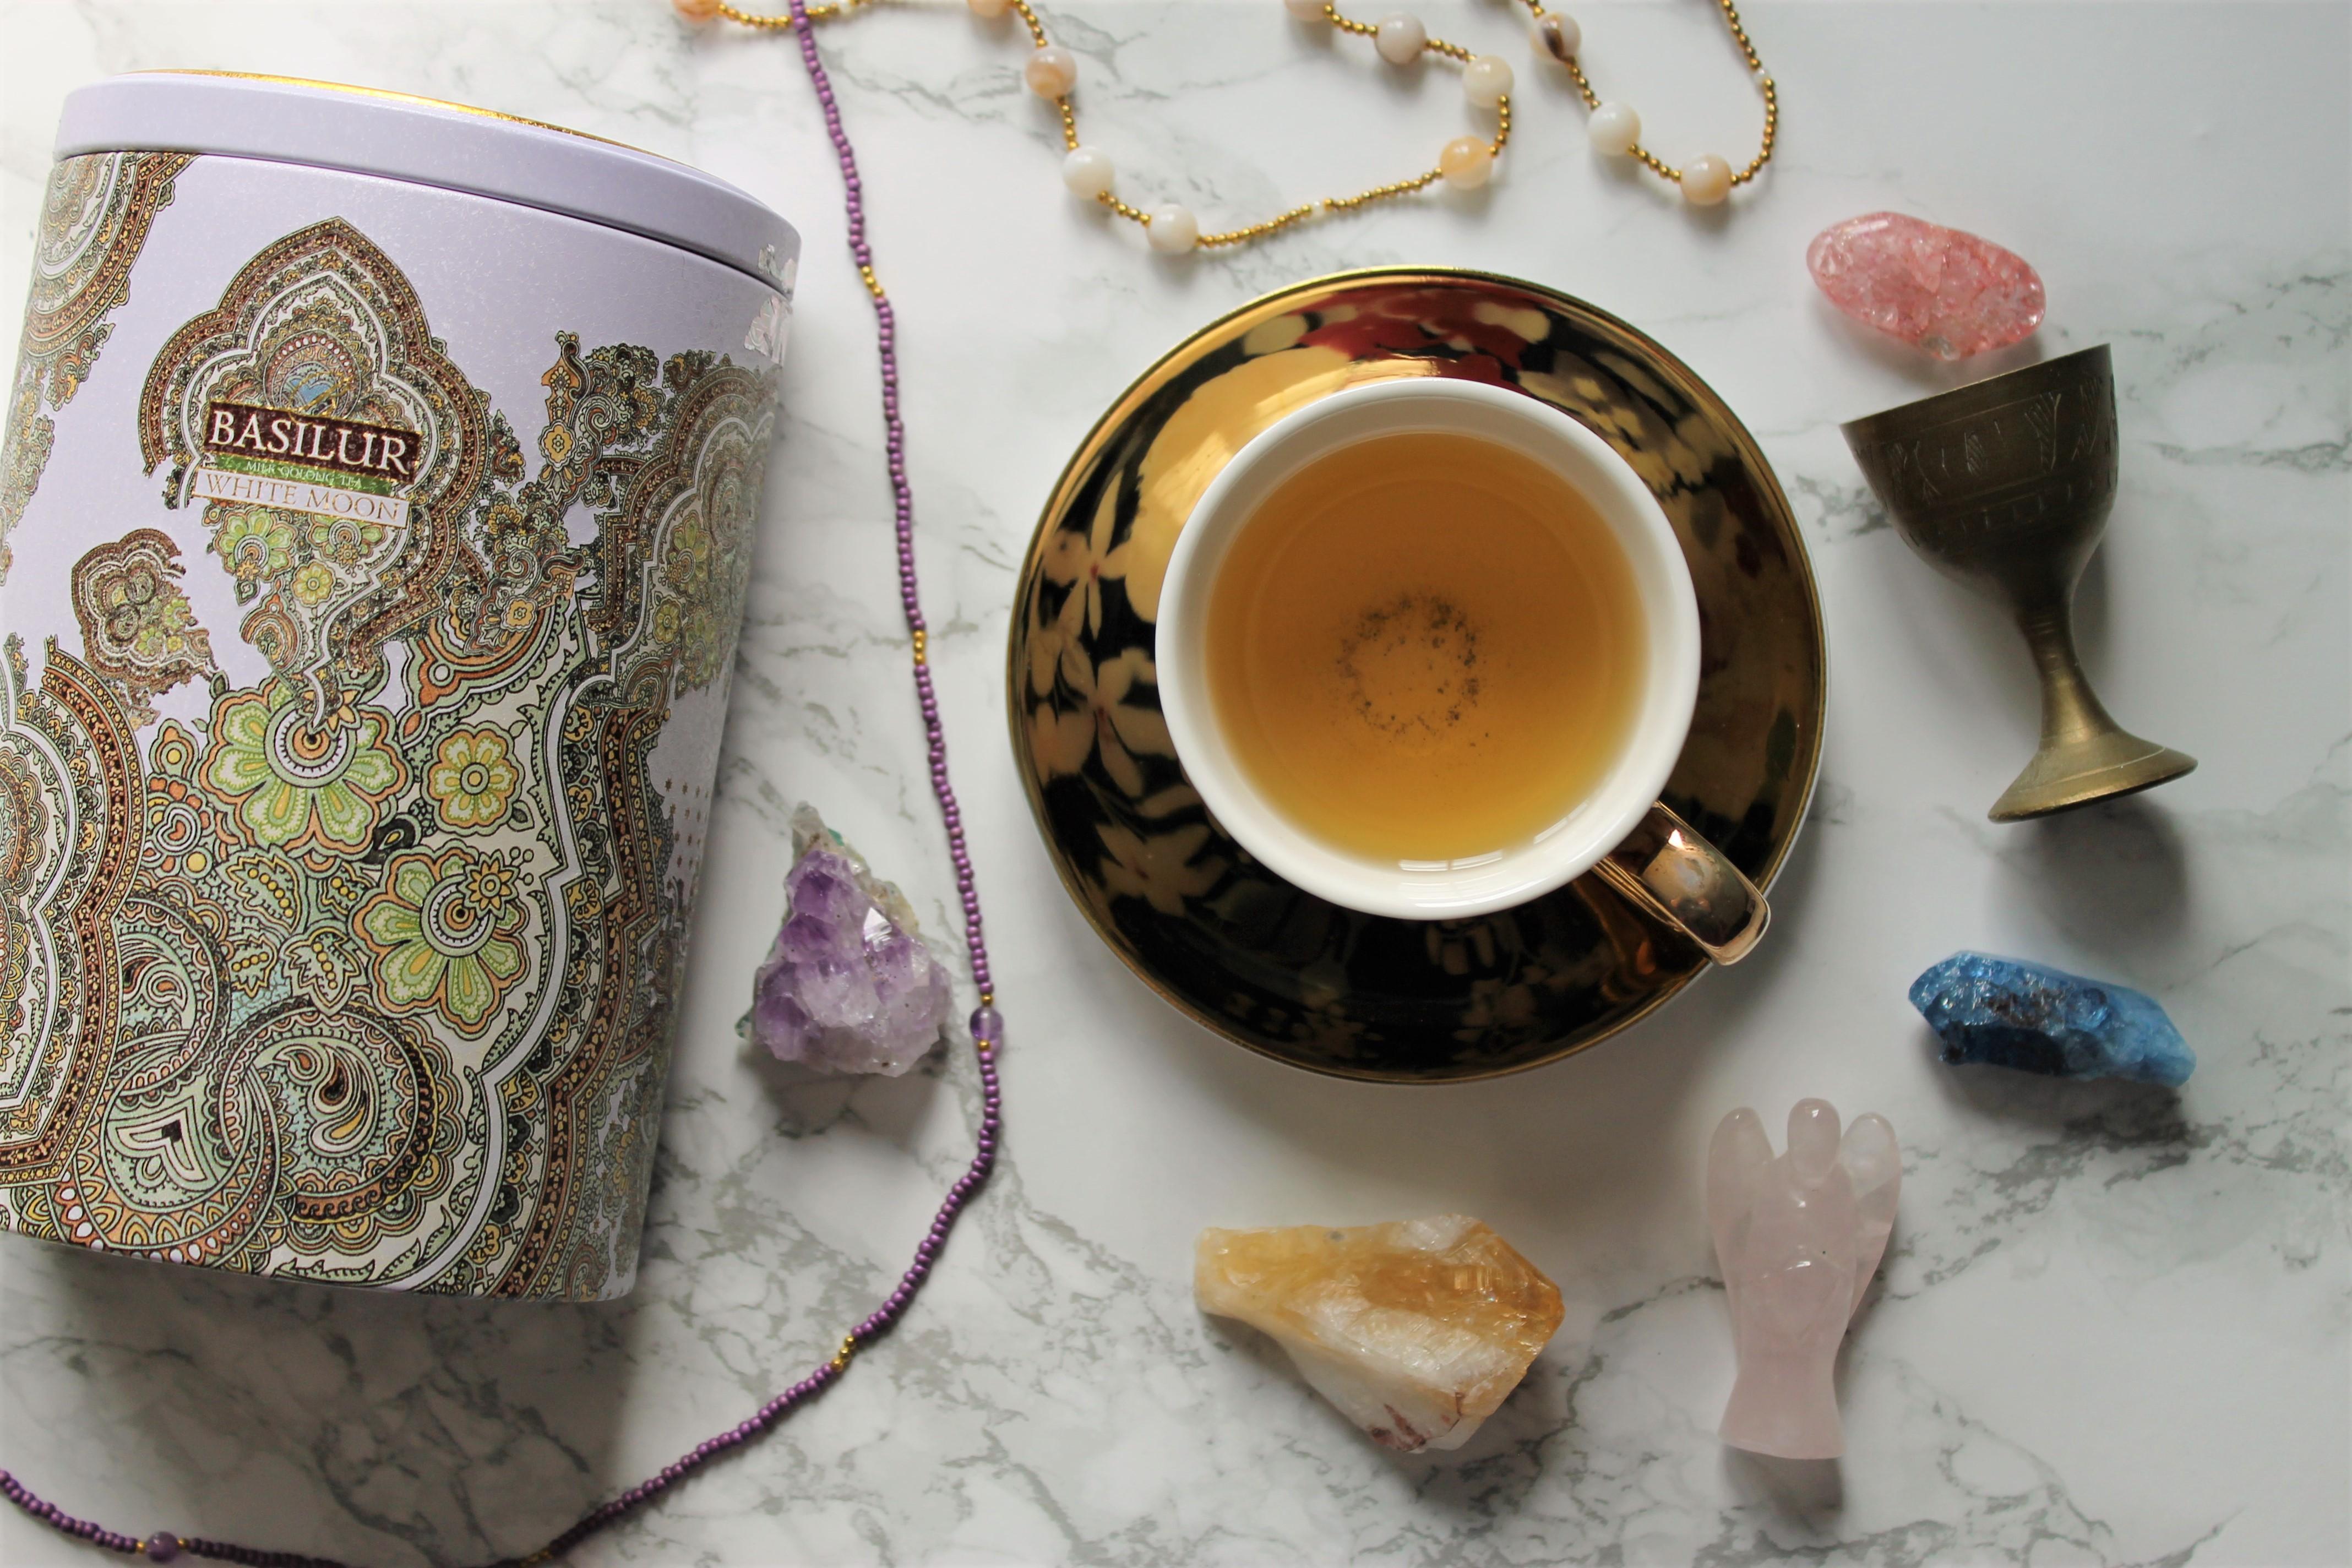 basilur white moon tea review